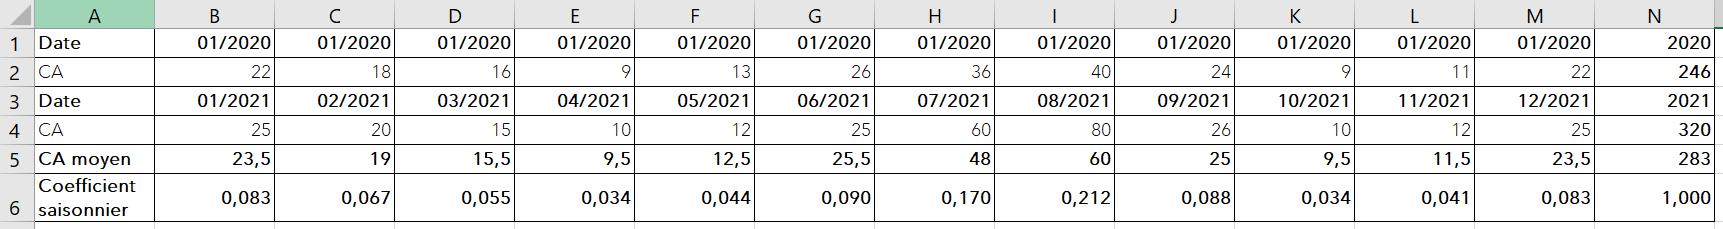 coefficient-saisonnier-moyen